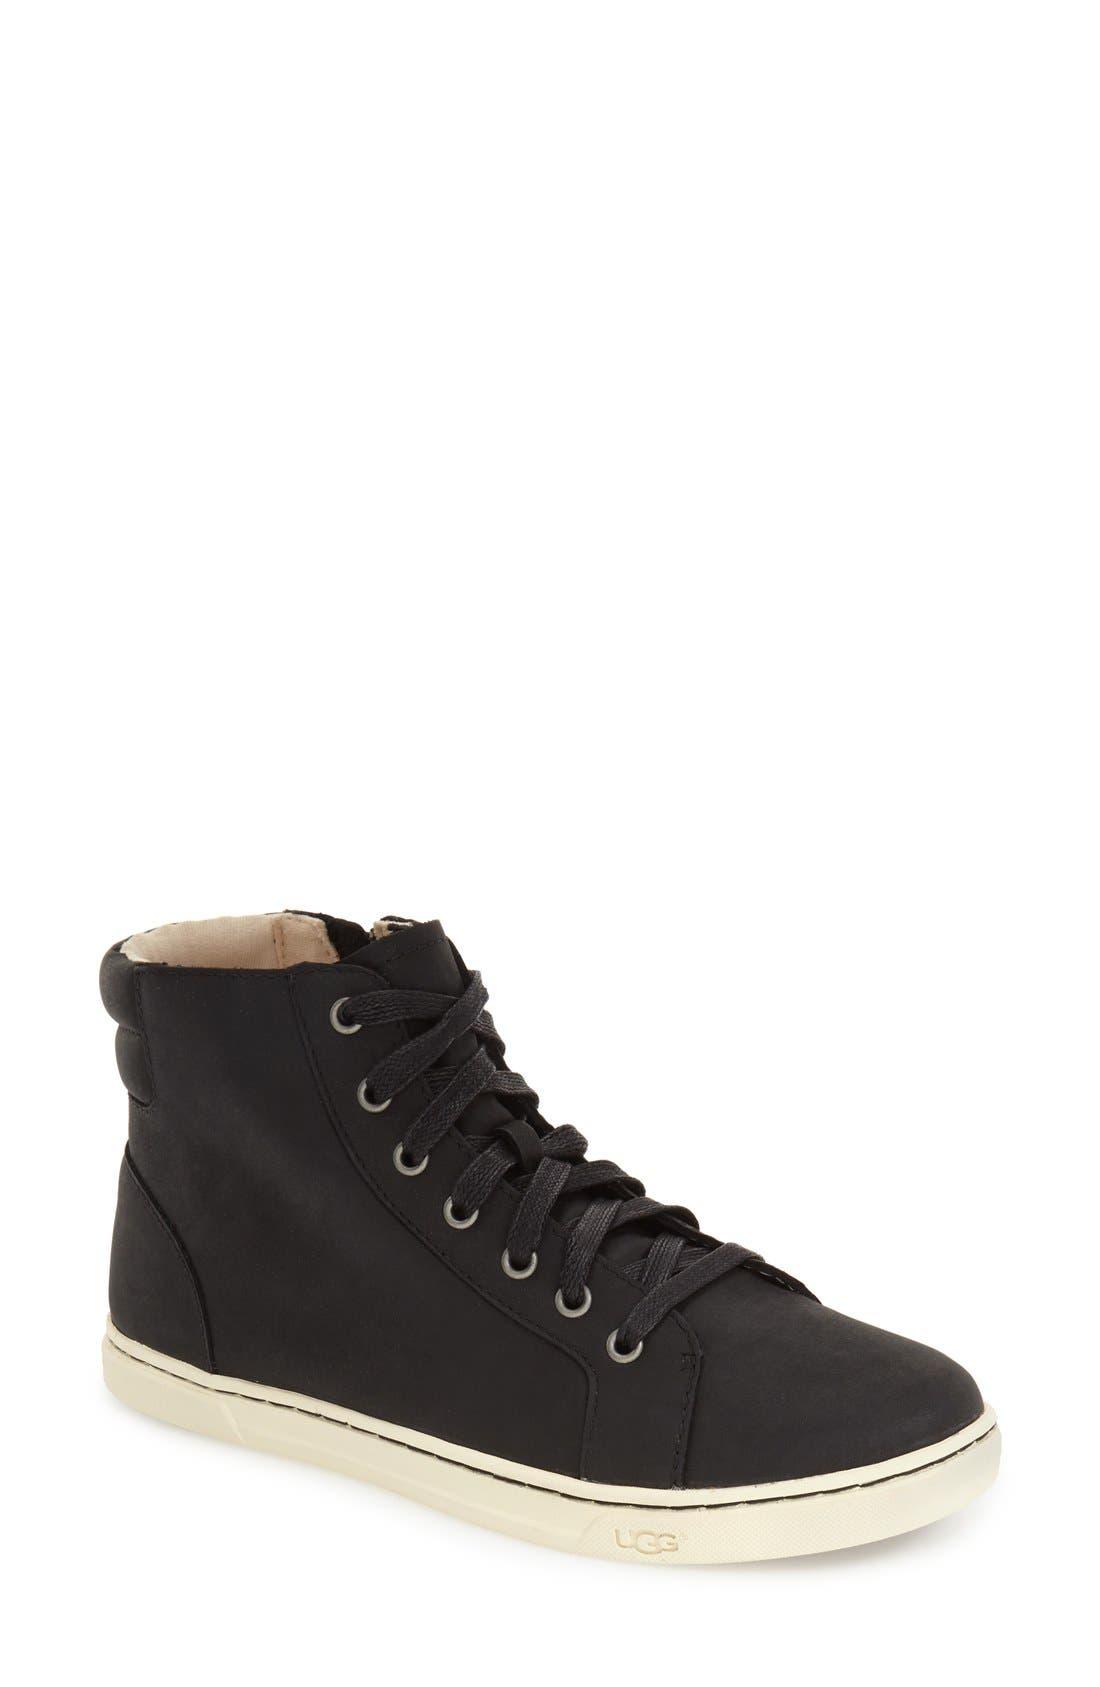 Main Image - UGG® 'Gradie' High Top Sneaker (Women)